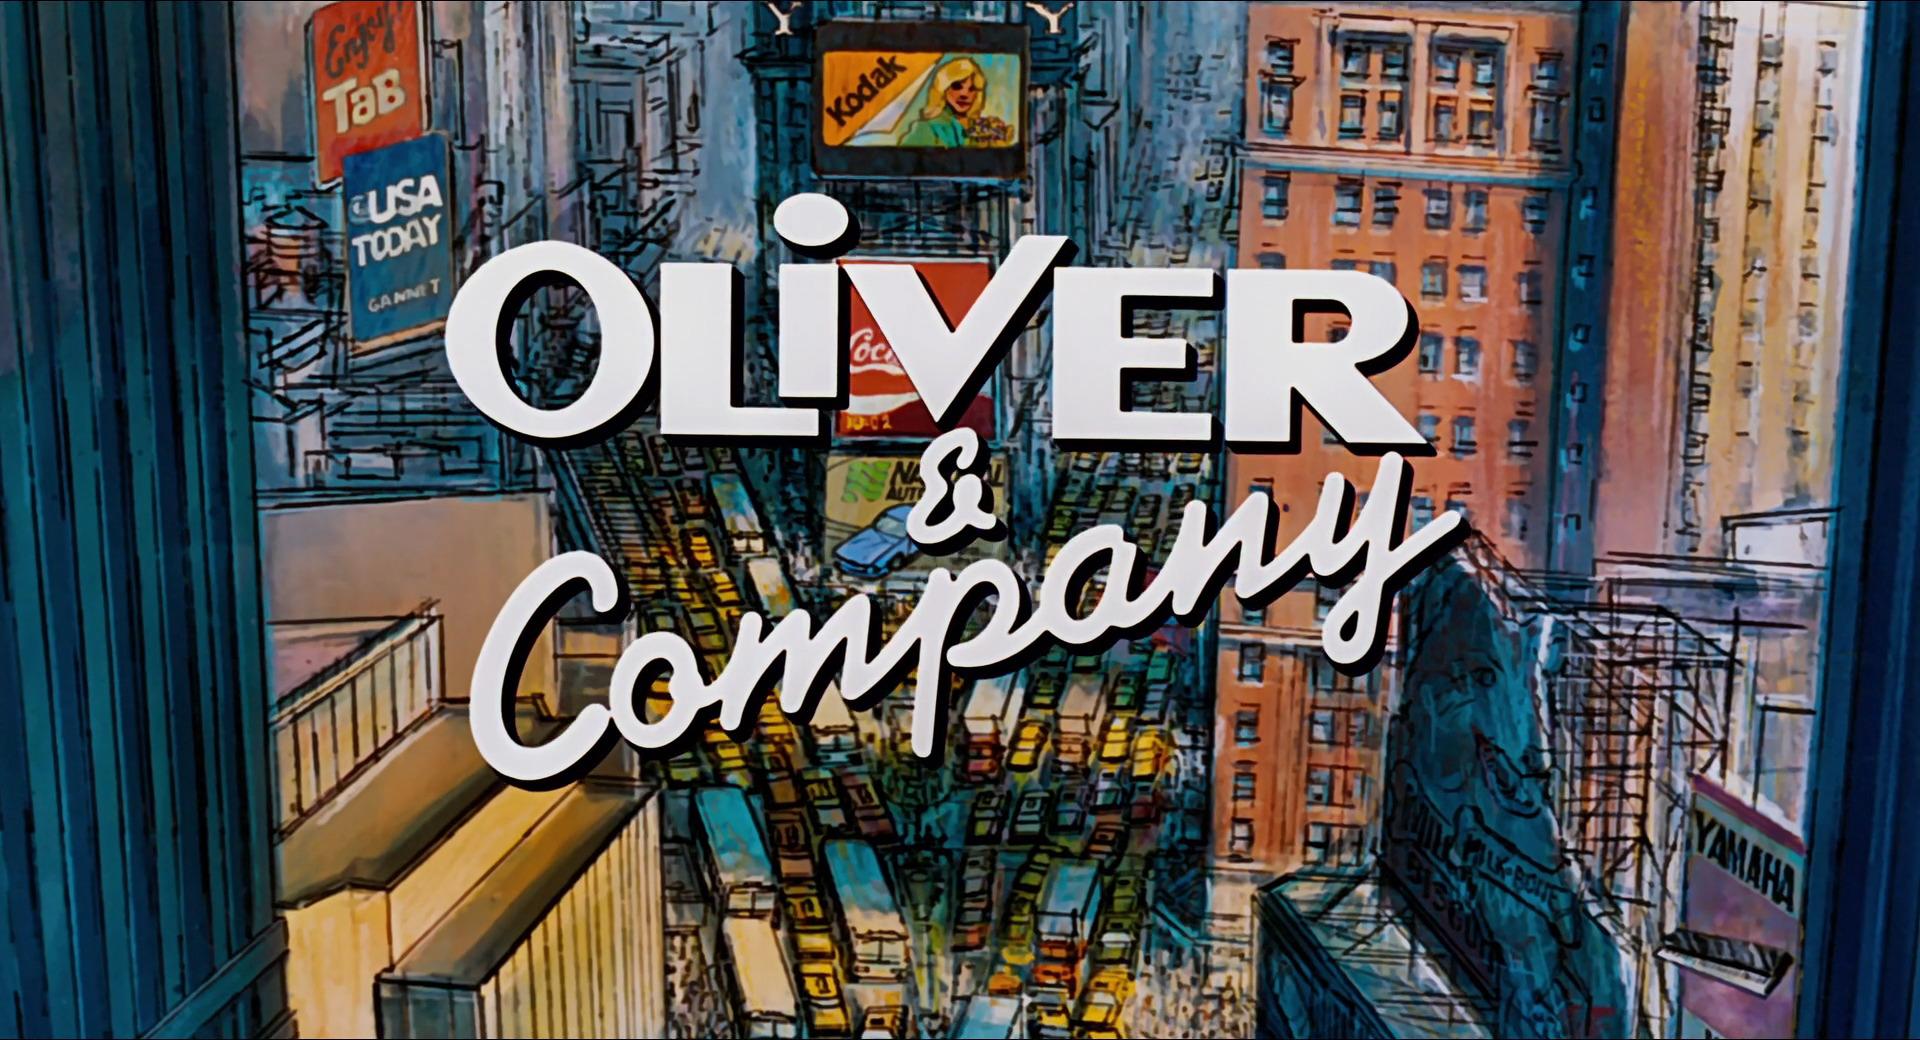 Oliver & Company (1988 film)